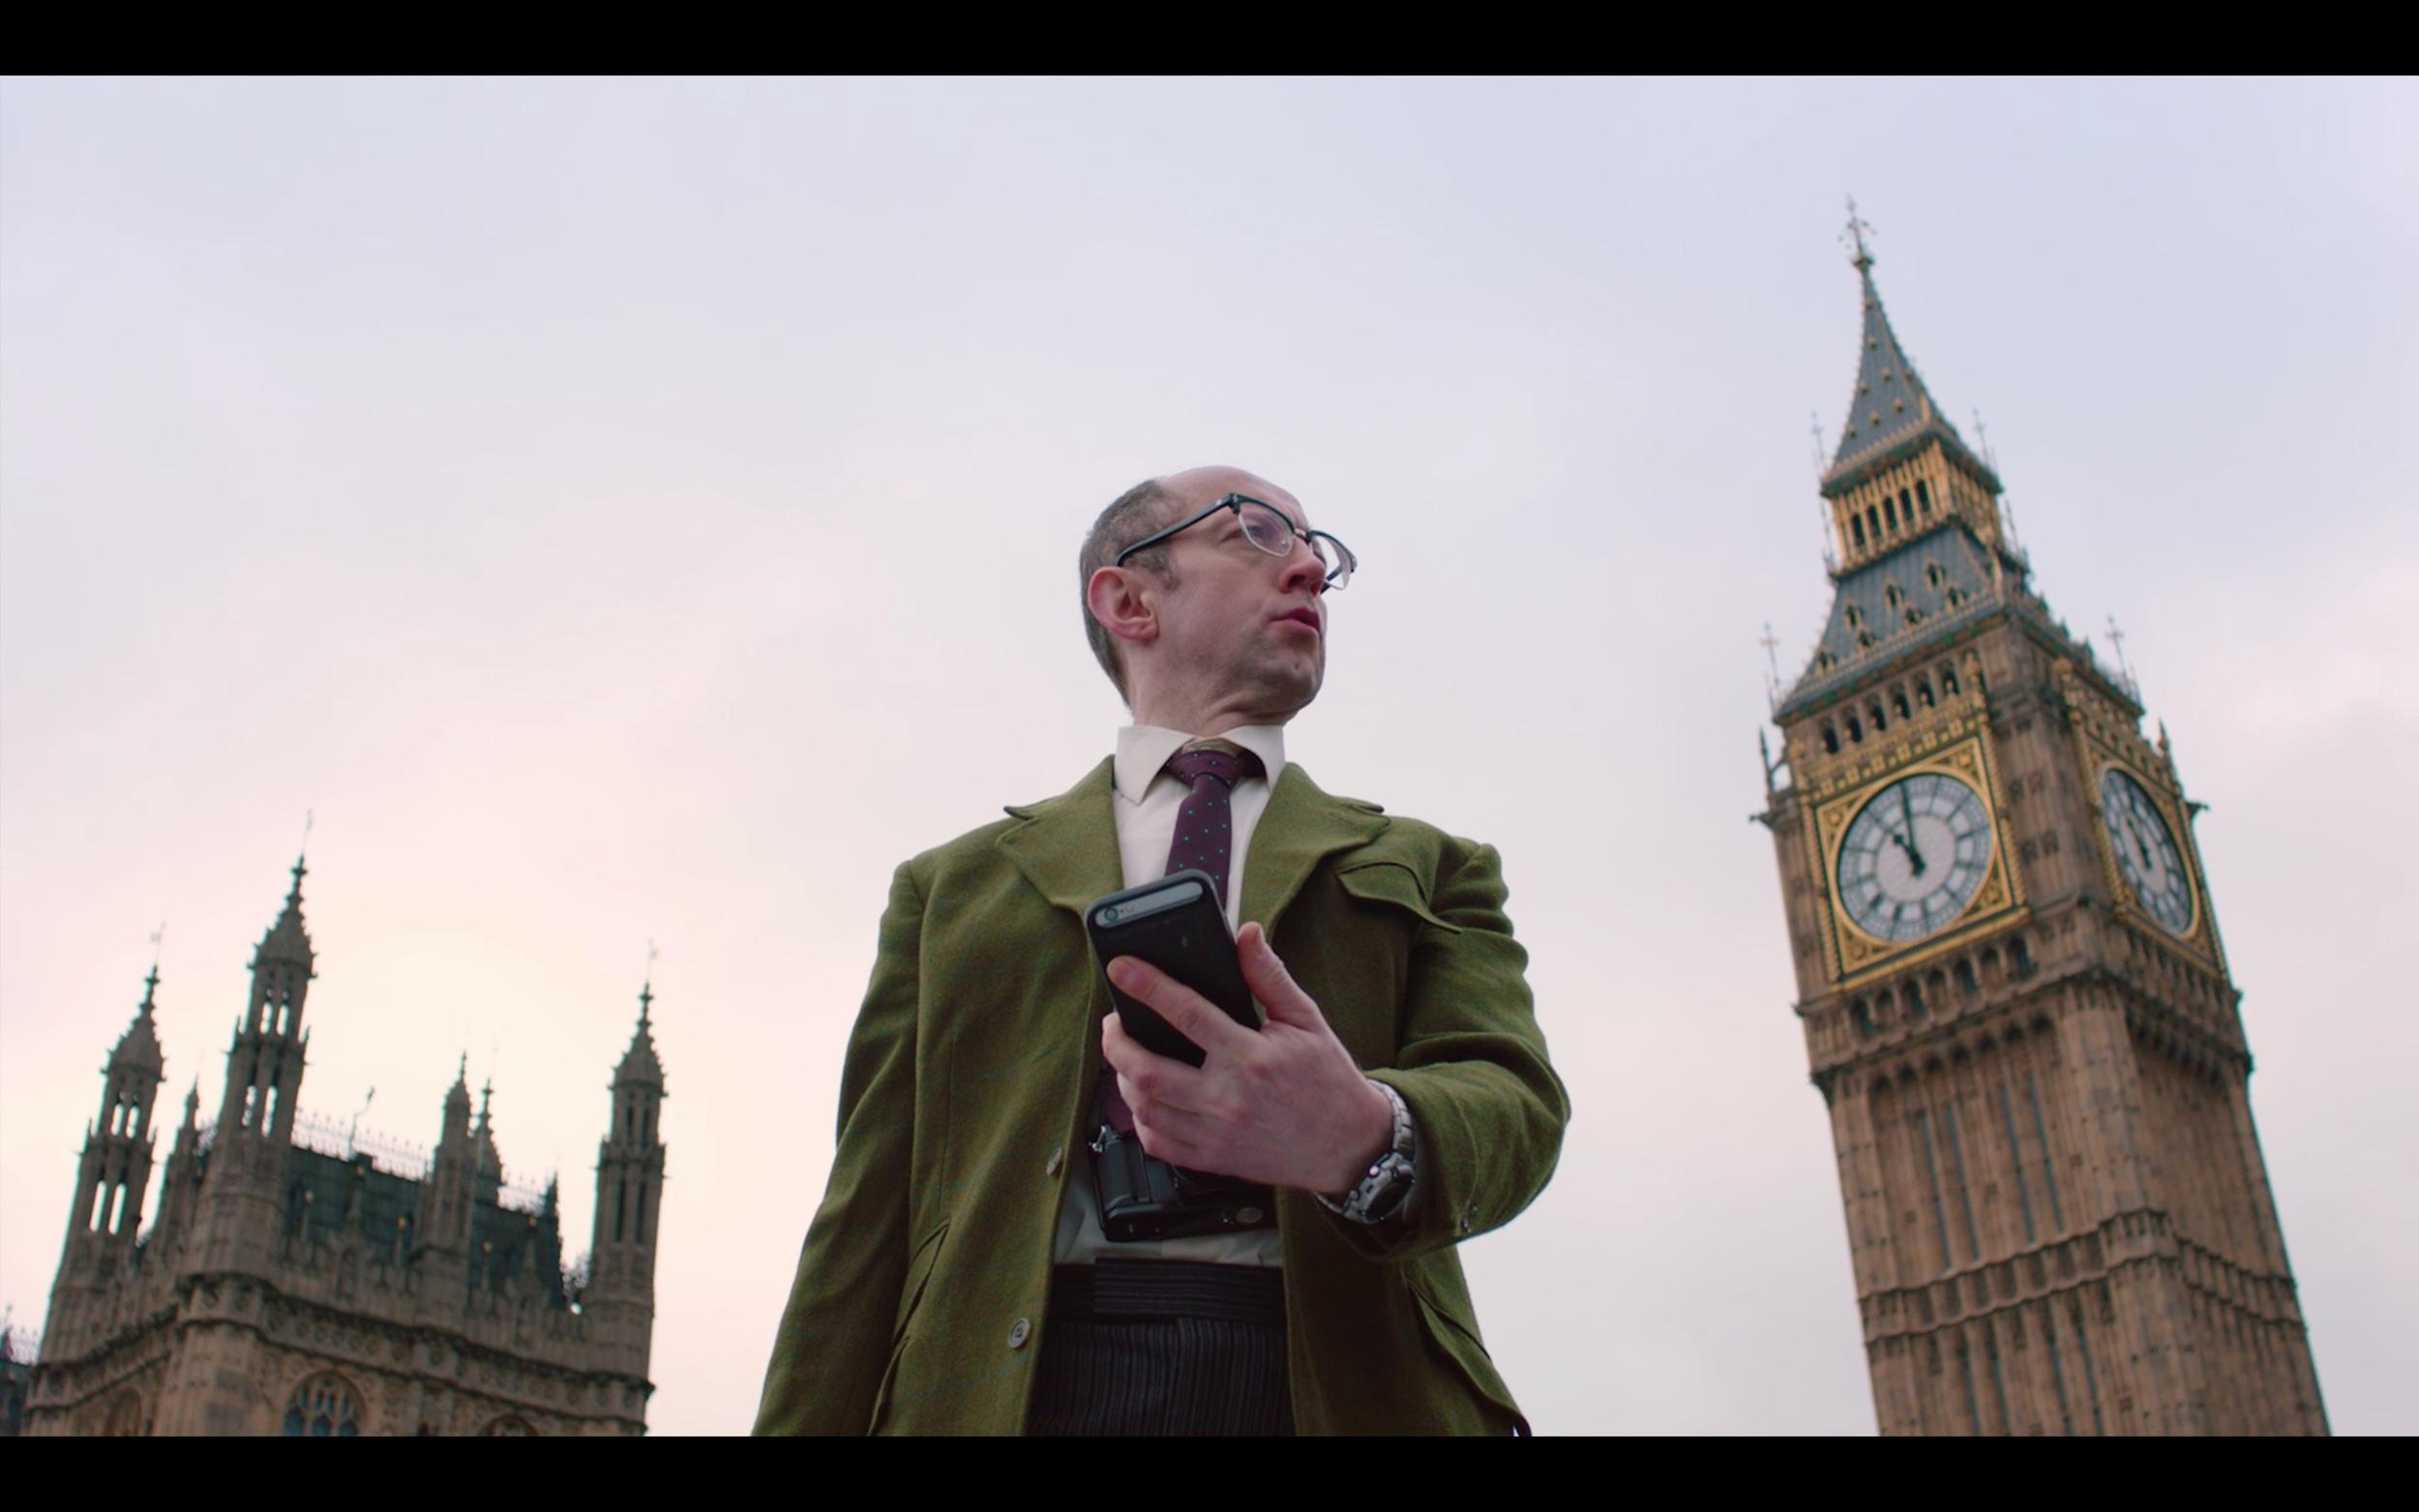 EE - Lost in London